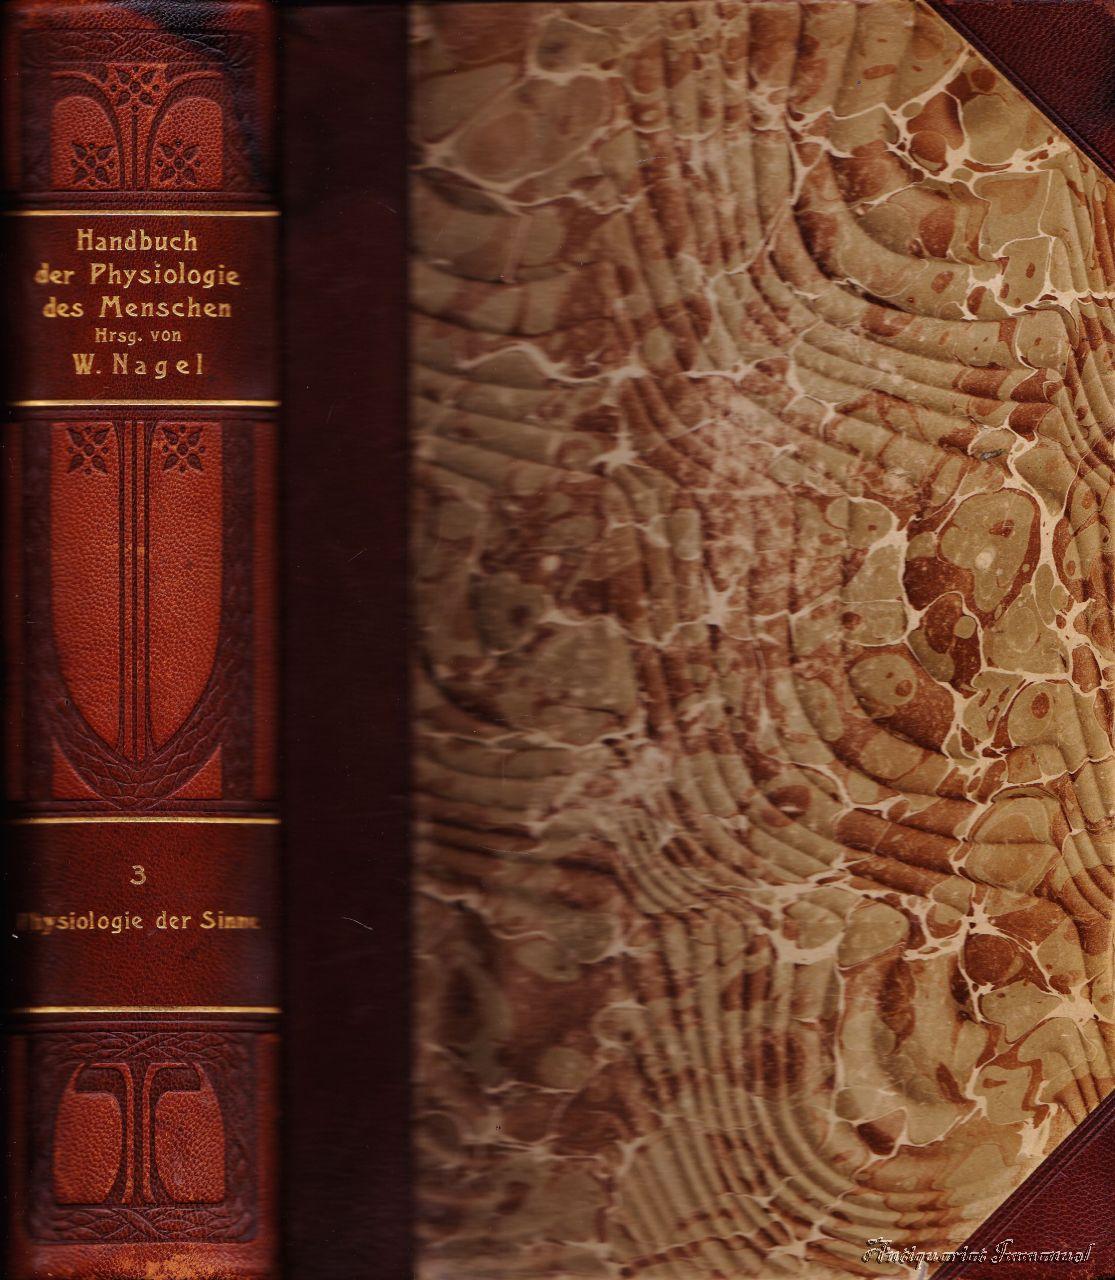 Handbuch der Physiologie des Menschen. Dritter Band: Nagel, W. (Hrsg.)